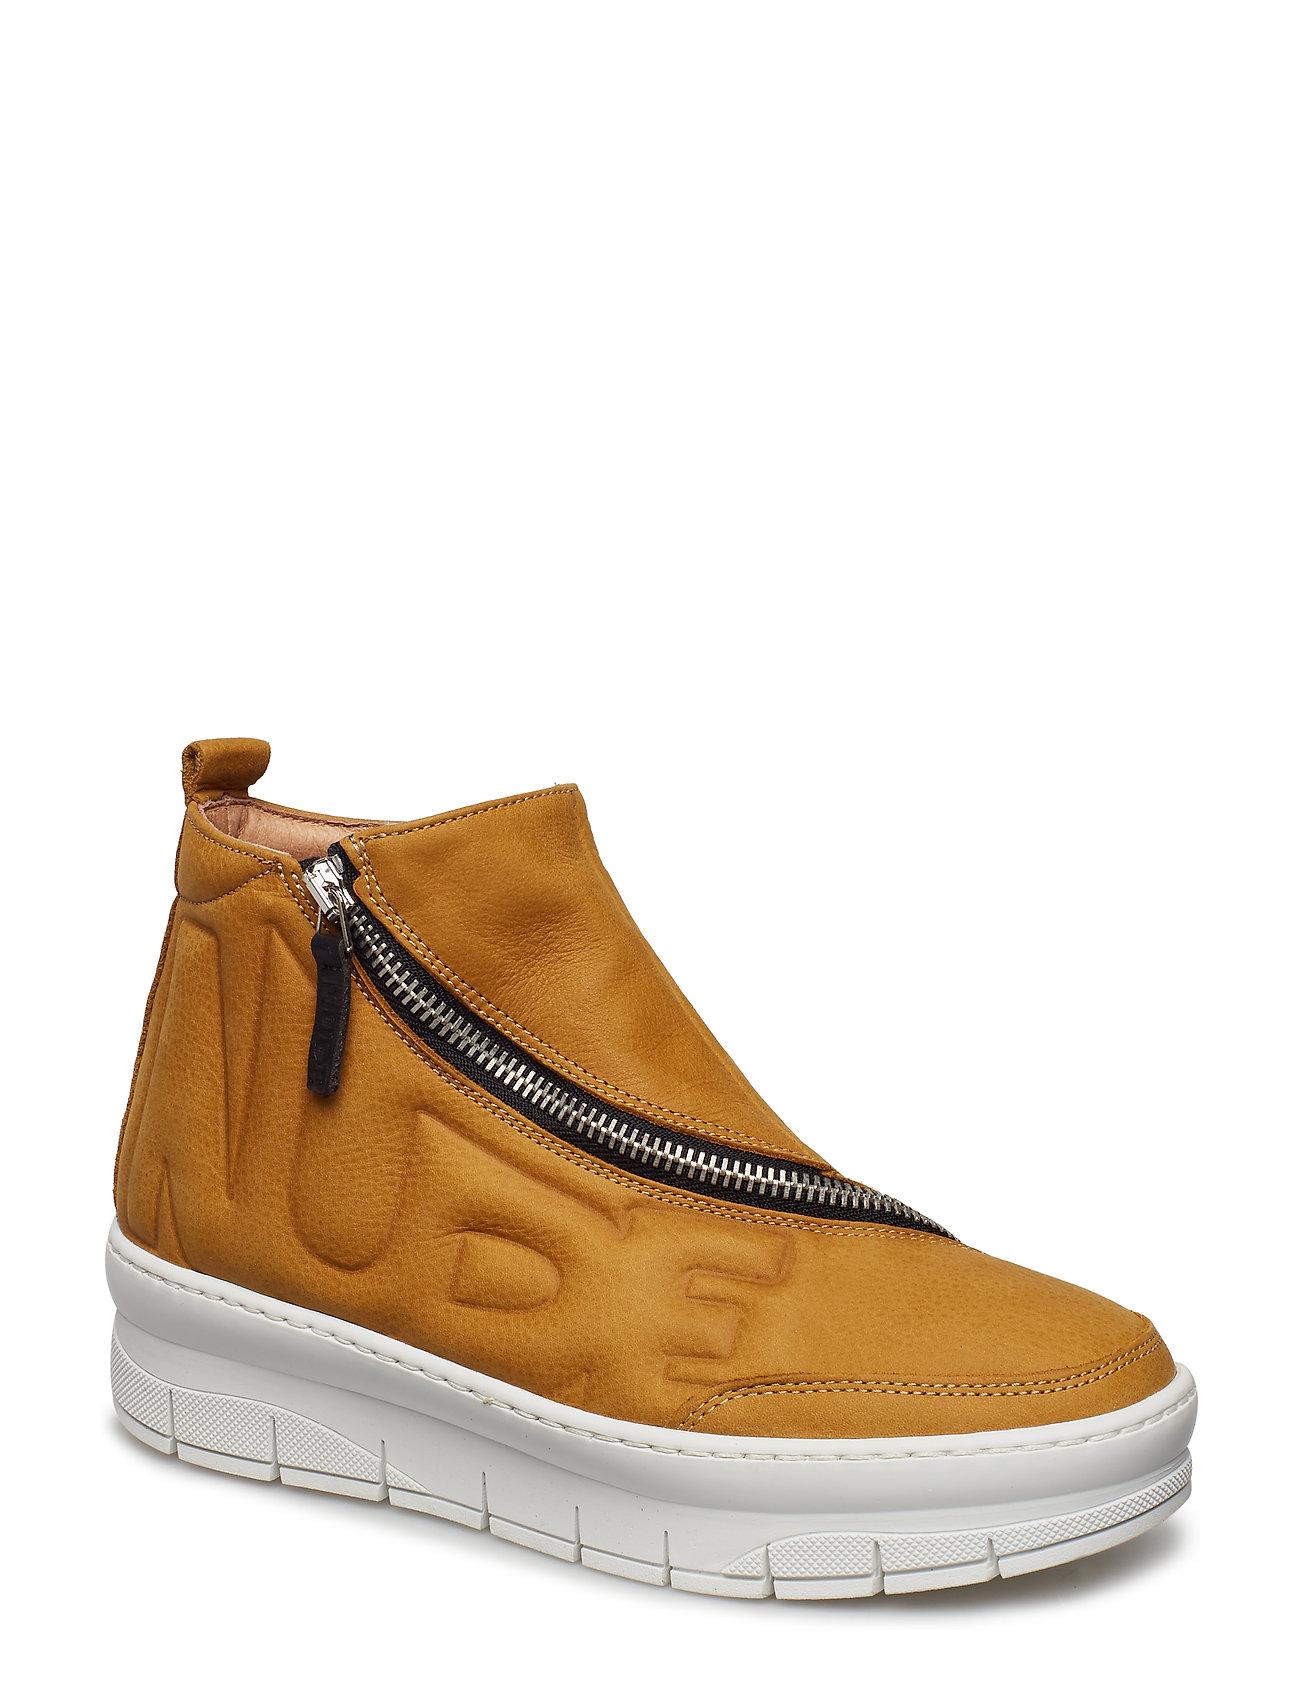 Hilda Sneaker Of Scandinavia Nude Orange Hohe K1l3cuTFJ